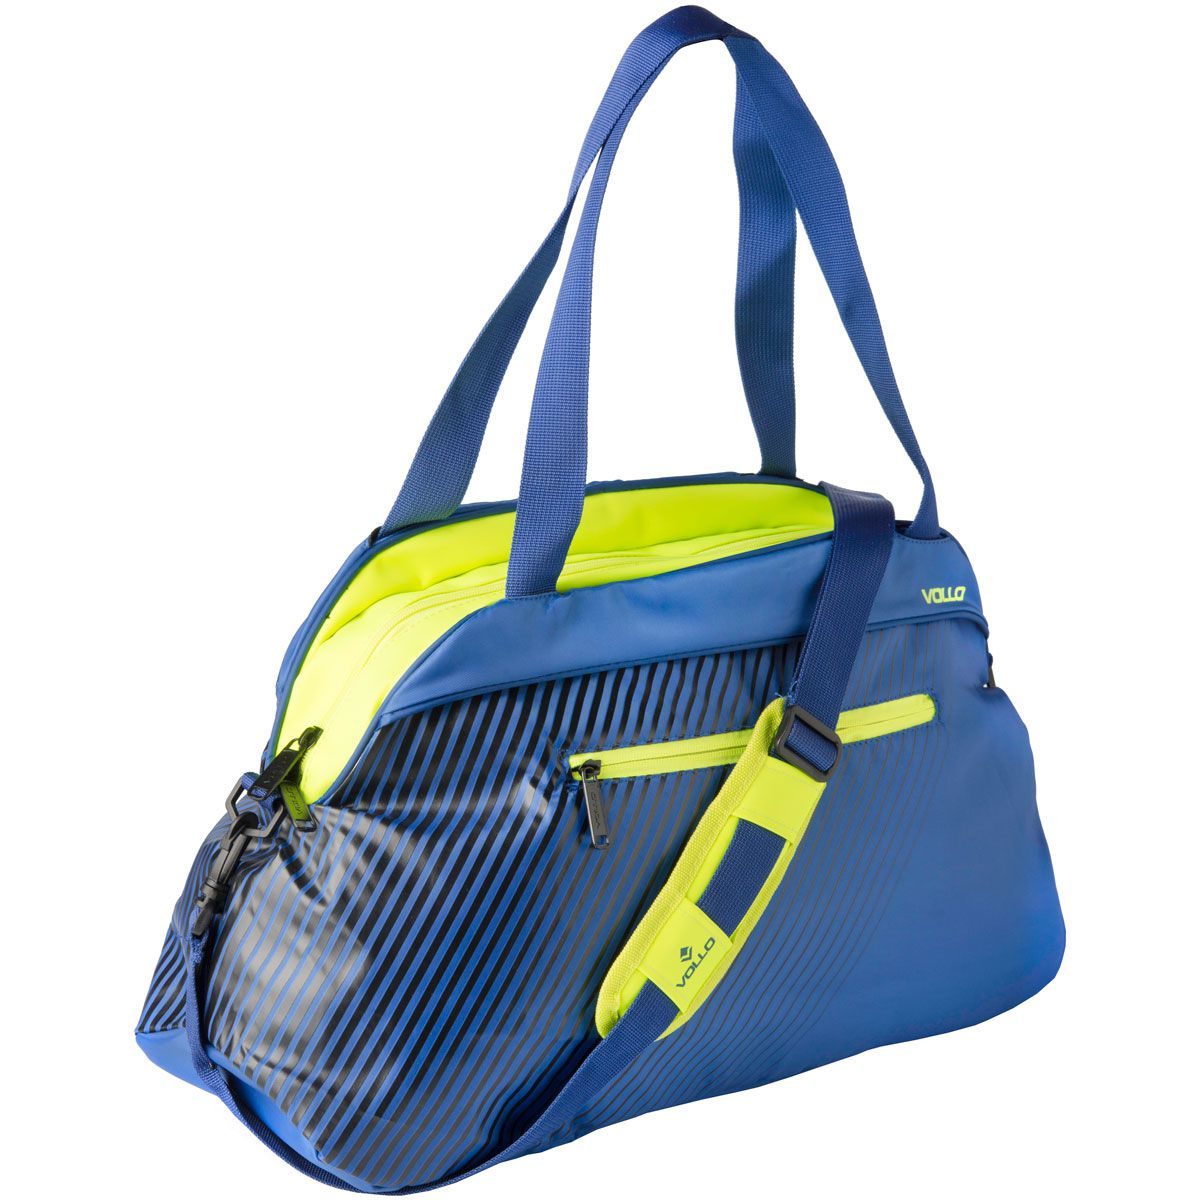 Bolsa Esportiva Academia Fitness Treino - Azul - Vollo  - PRALUTA SHOP